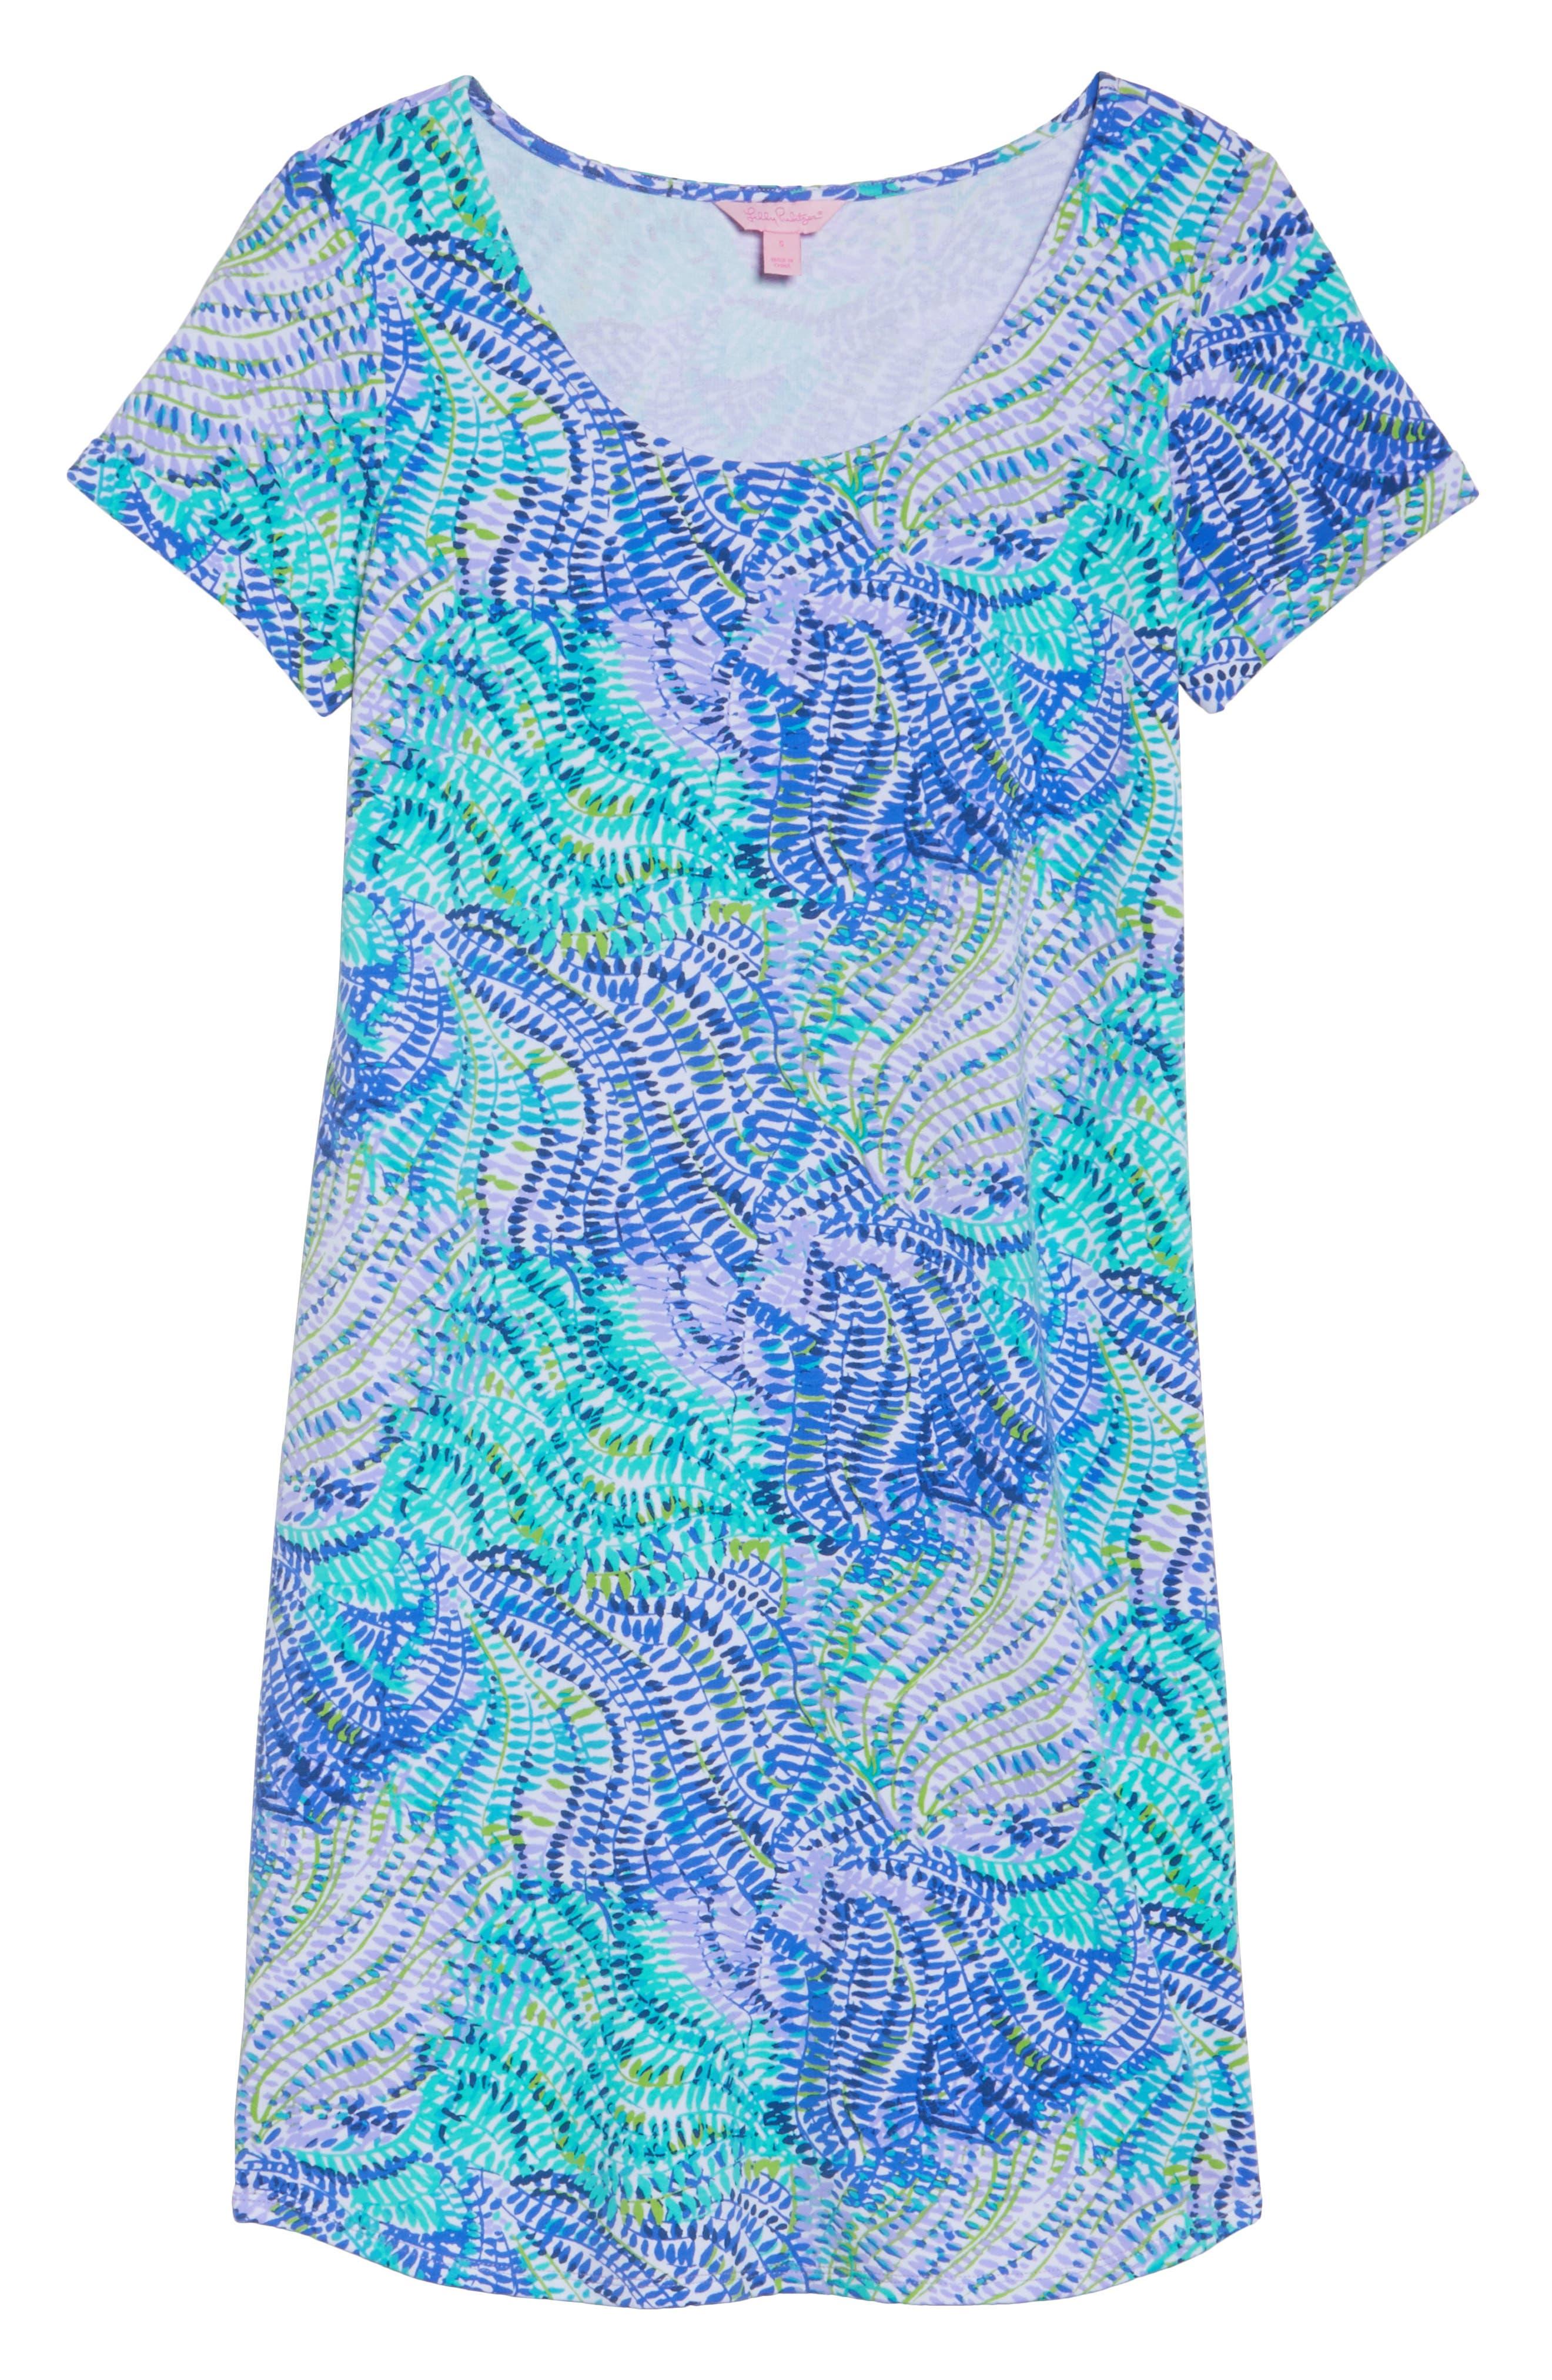 Tammy UPF 50 Dress,                             Alternate thumbnail 6, color,                             454